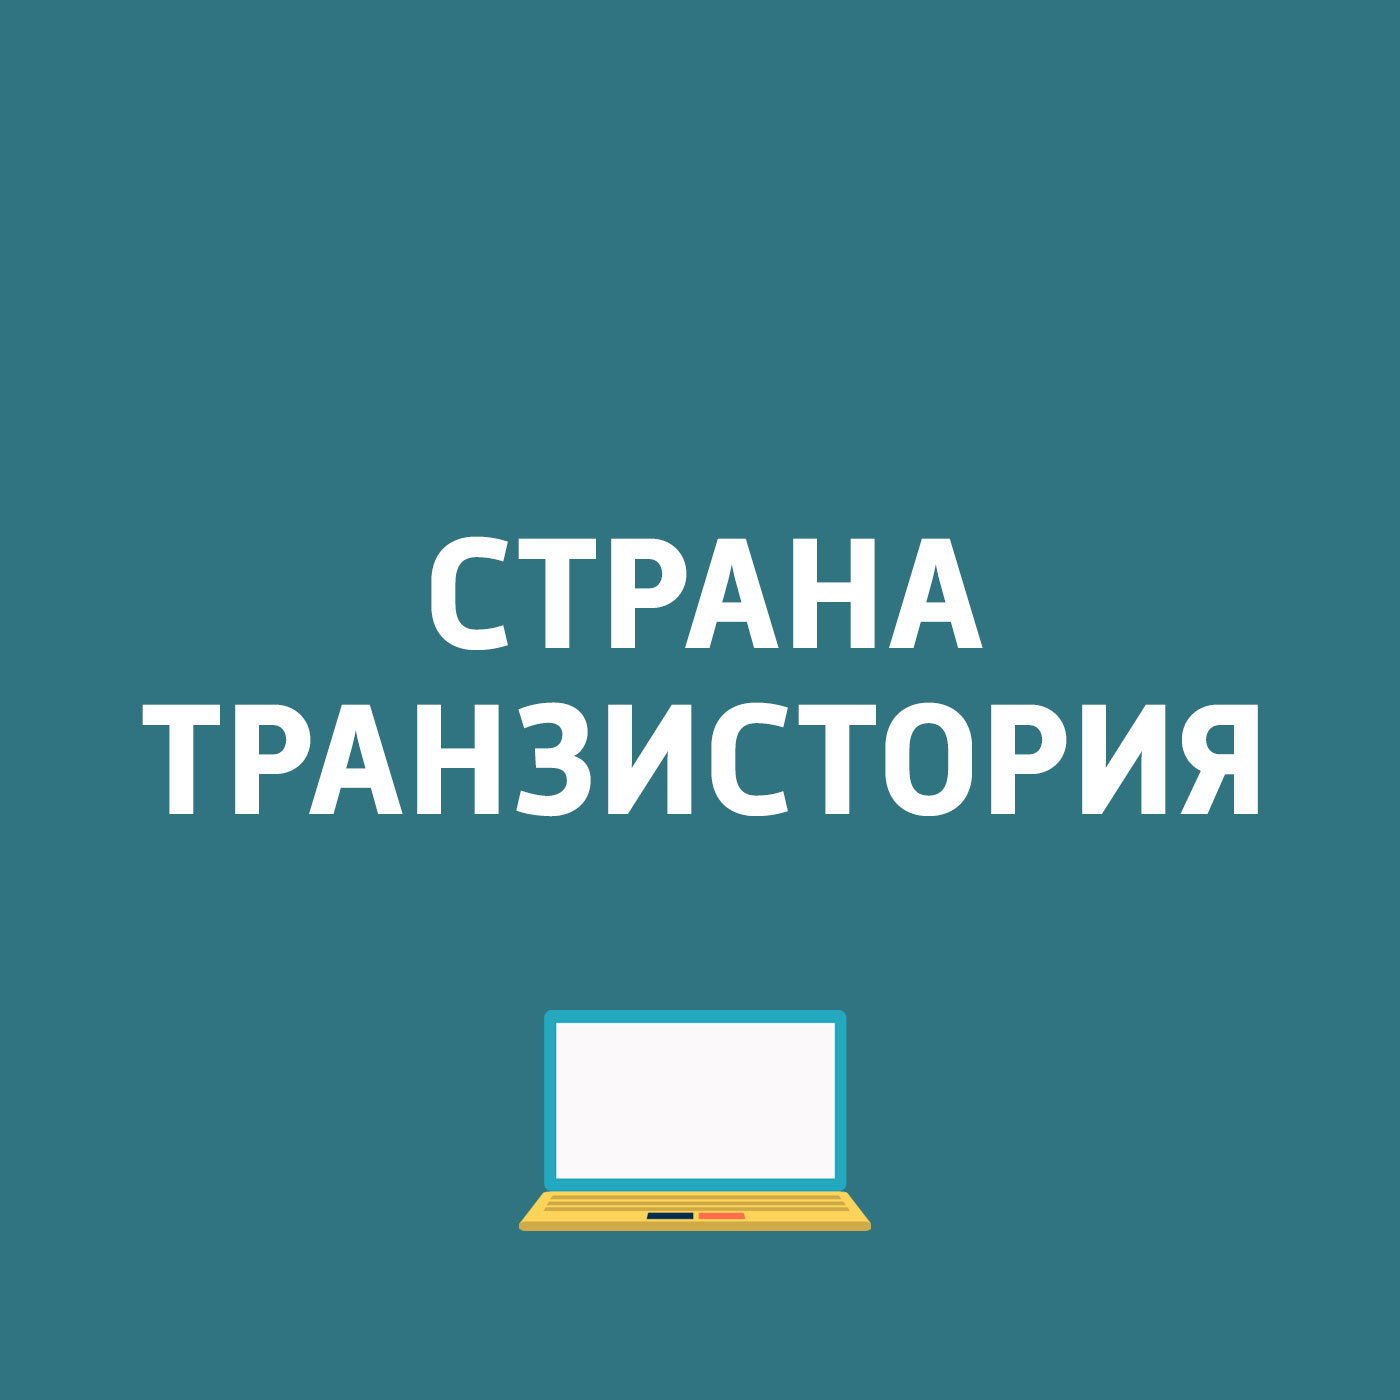 Картаев Павел Oukitel K6000 Premium получит 6 ГБ ОЗУ. LeEco Le 2 лишится 3,5-мм разъема.... смартфон интернет магазин хонор 9